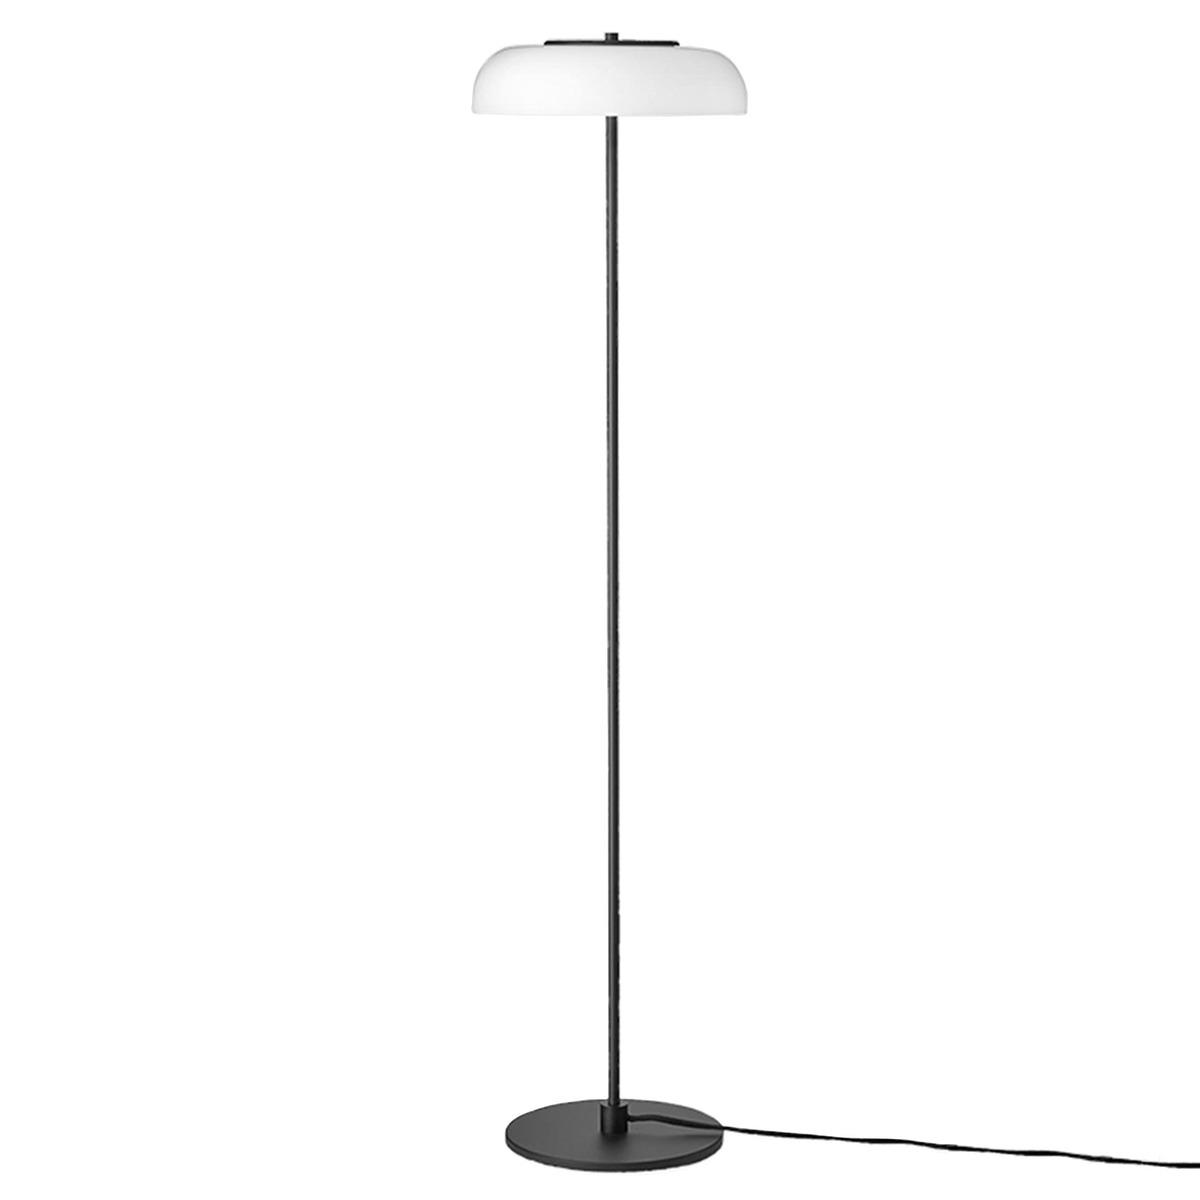 Nuura Blossi Floor Lamp 29 Cm, Satin Black - Opal White